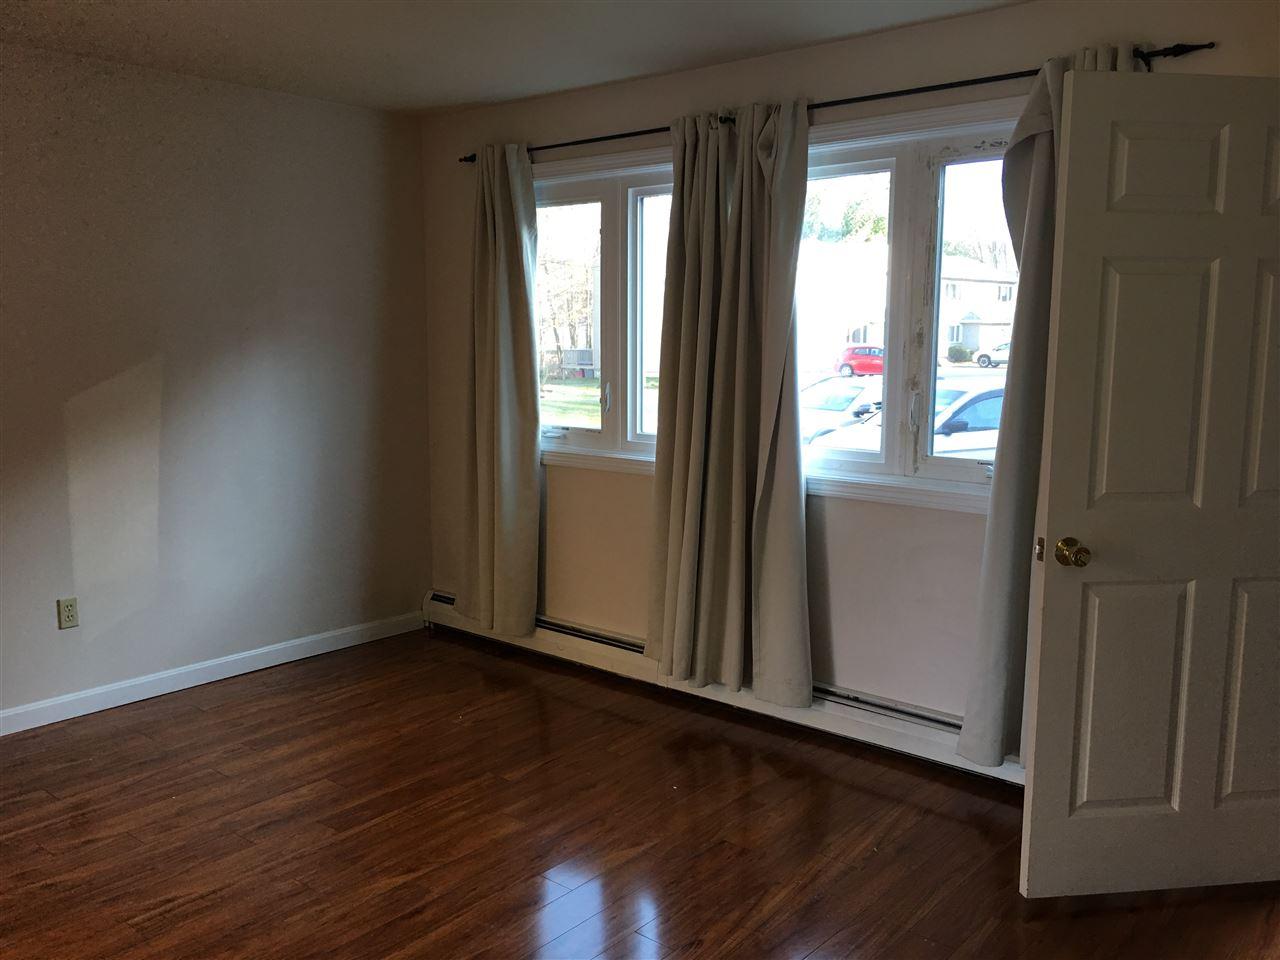 Living Room 11255903